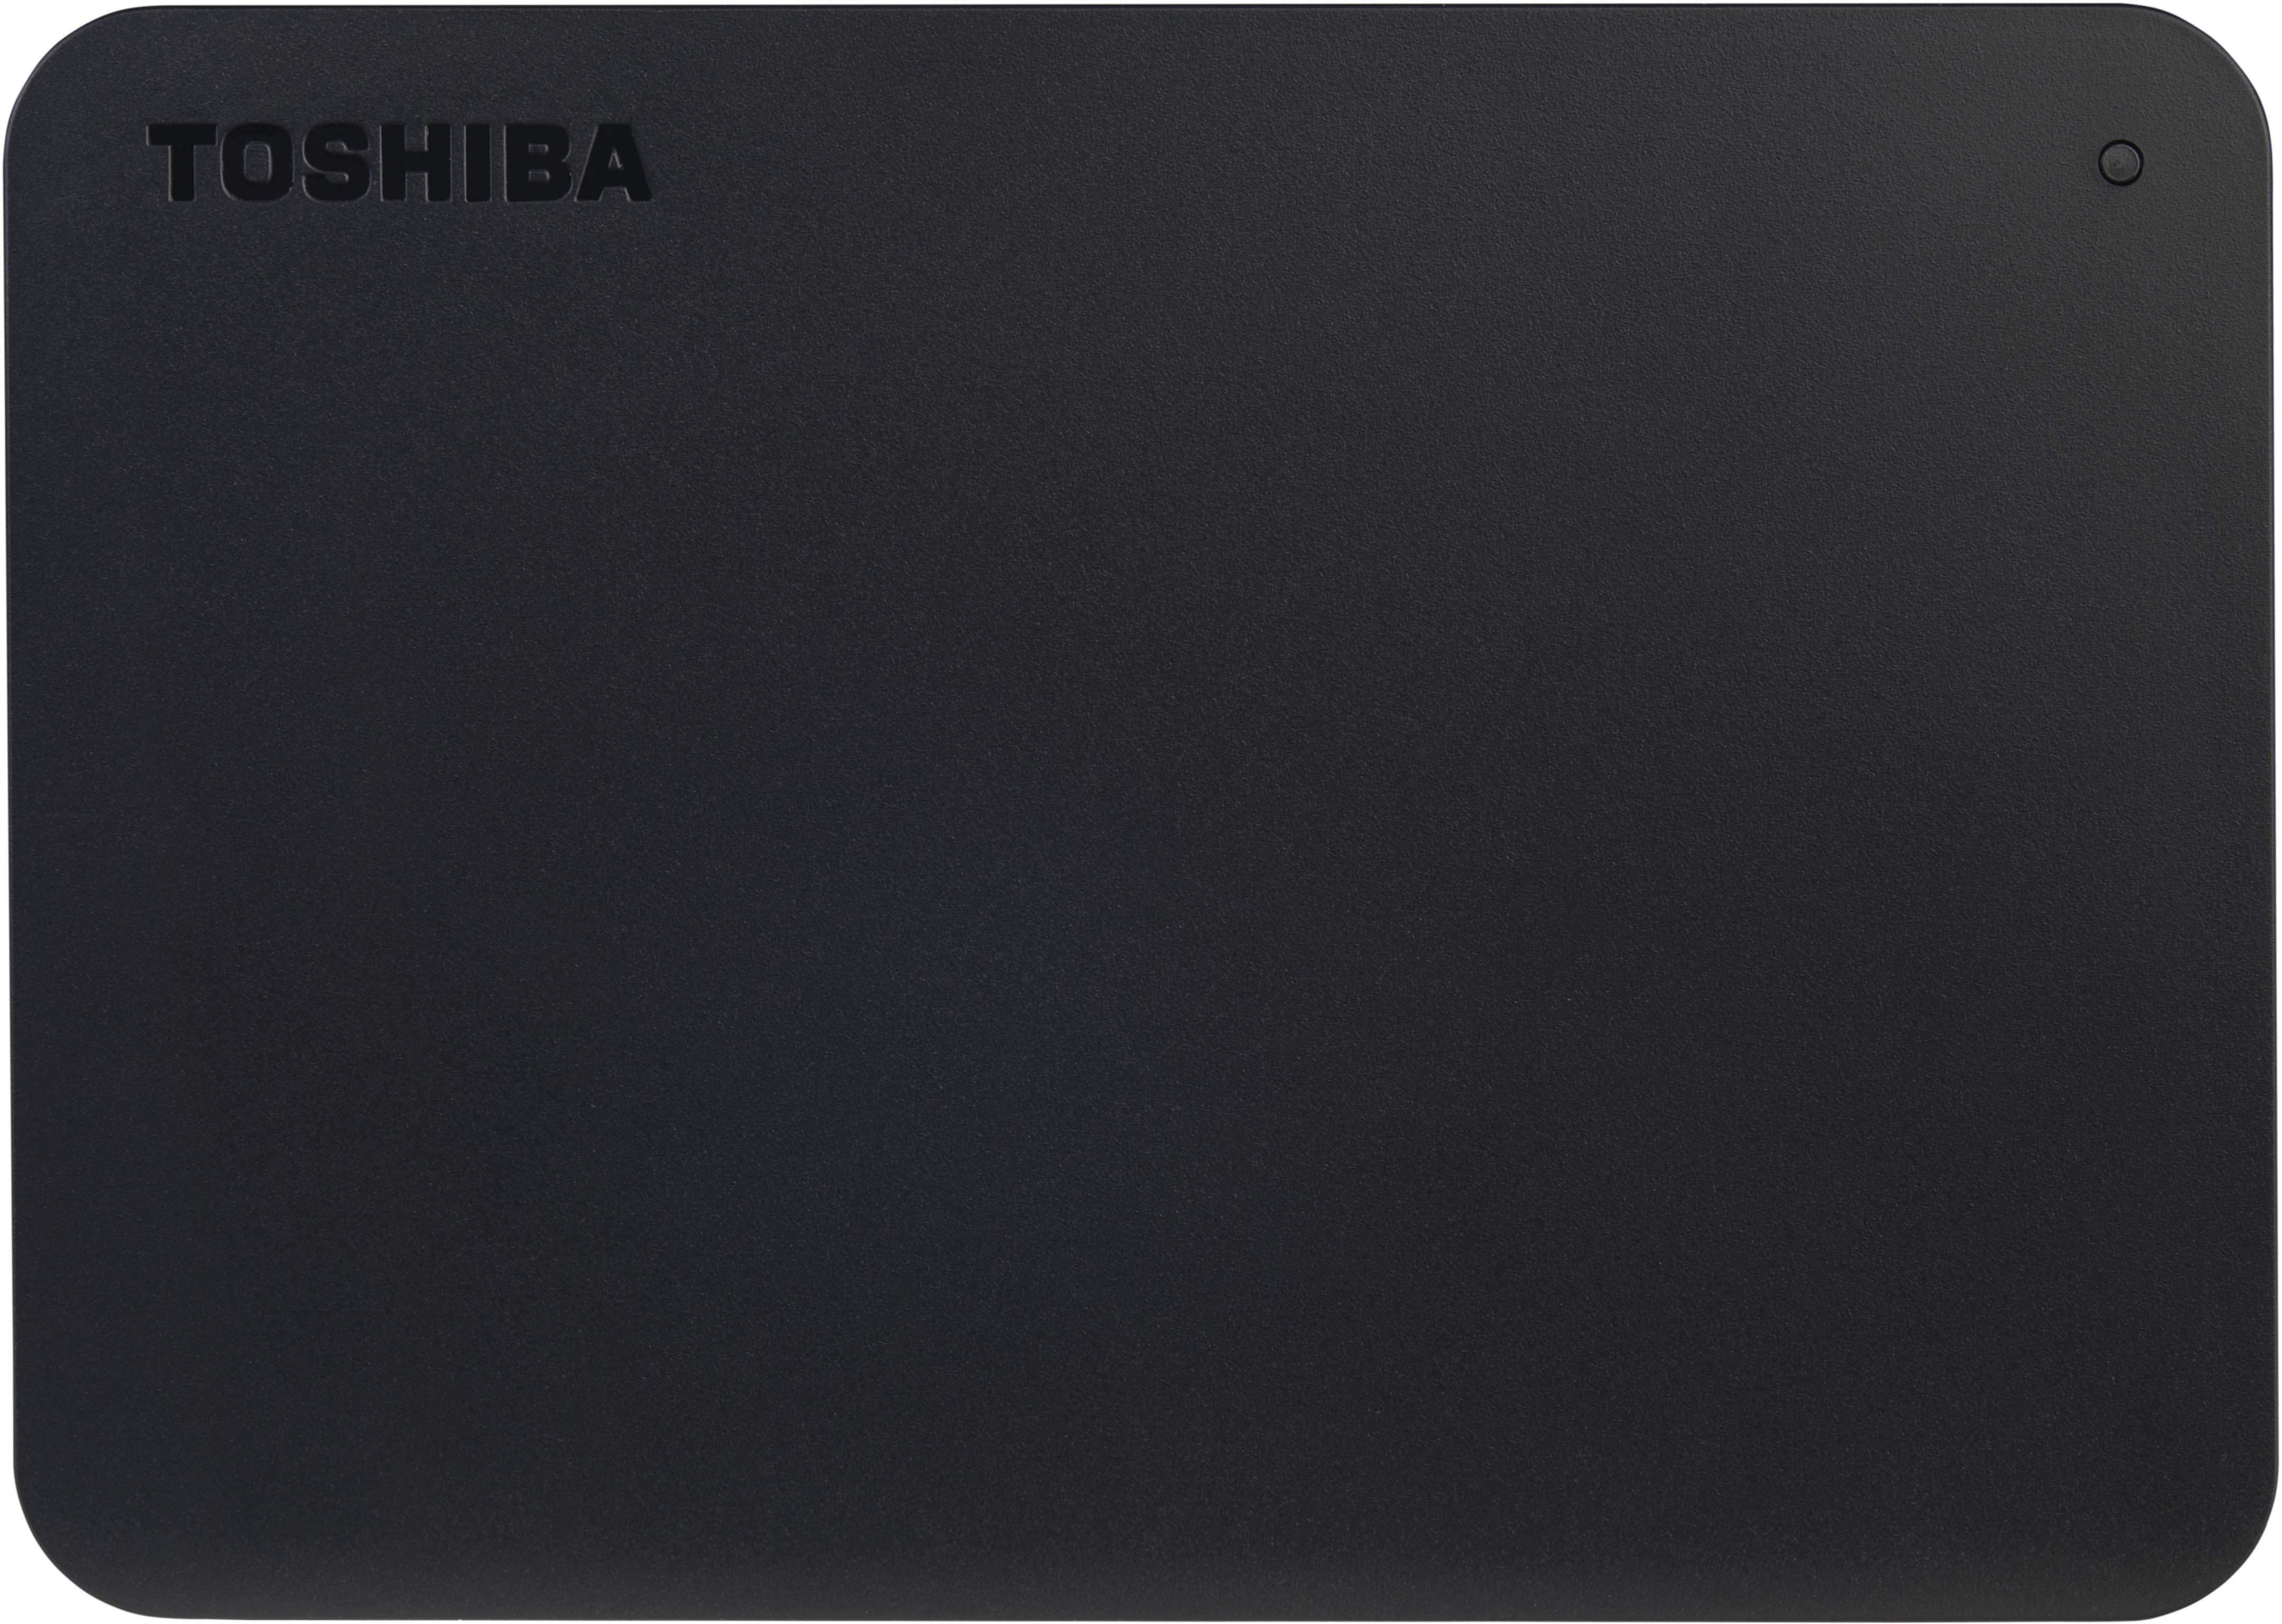 Toshiba externe harde schijf Canvio Basics 2TB